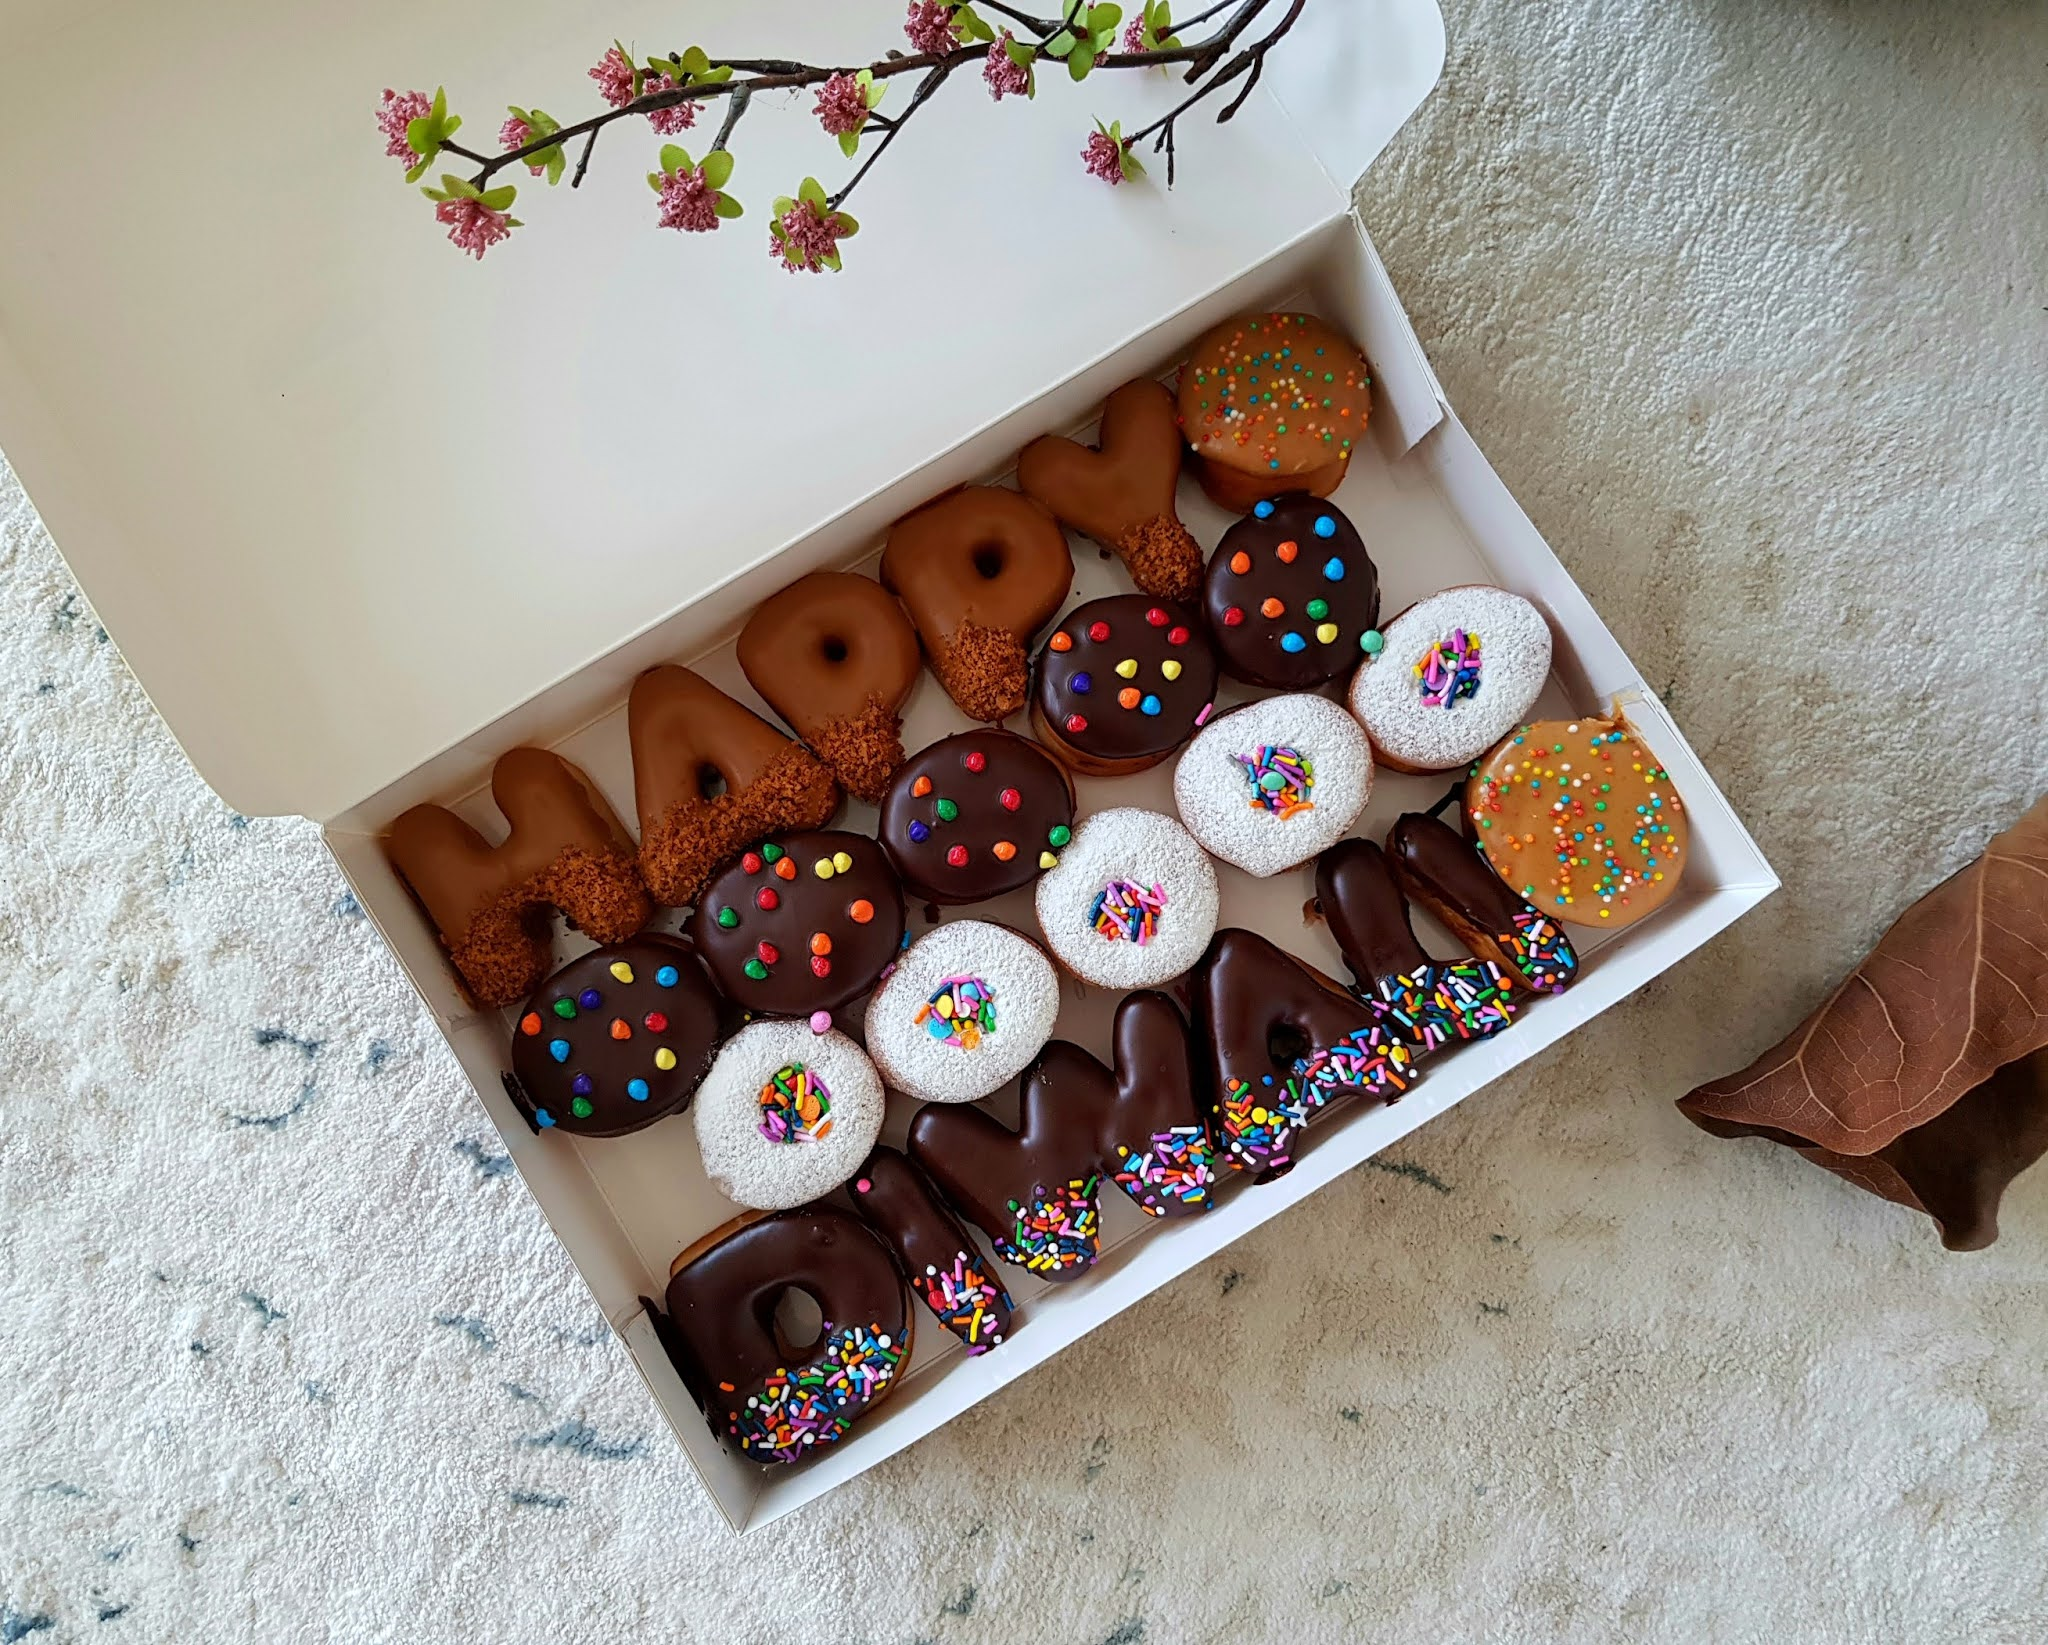 Best vegan donuts in Dubai - Best vegan treats and vegan gifts in Dubai - Vegan Desserts in Dubai